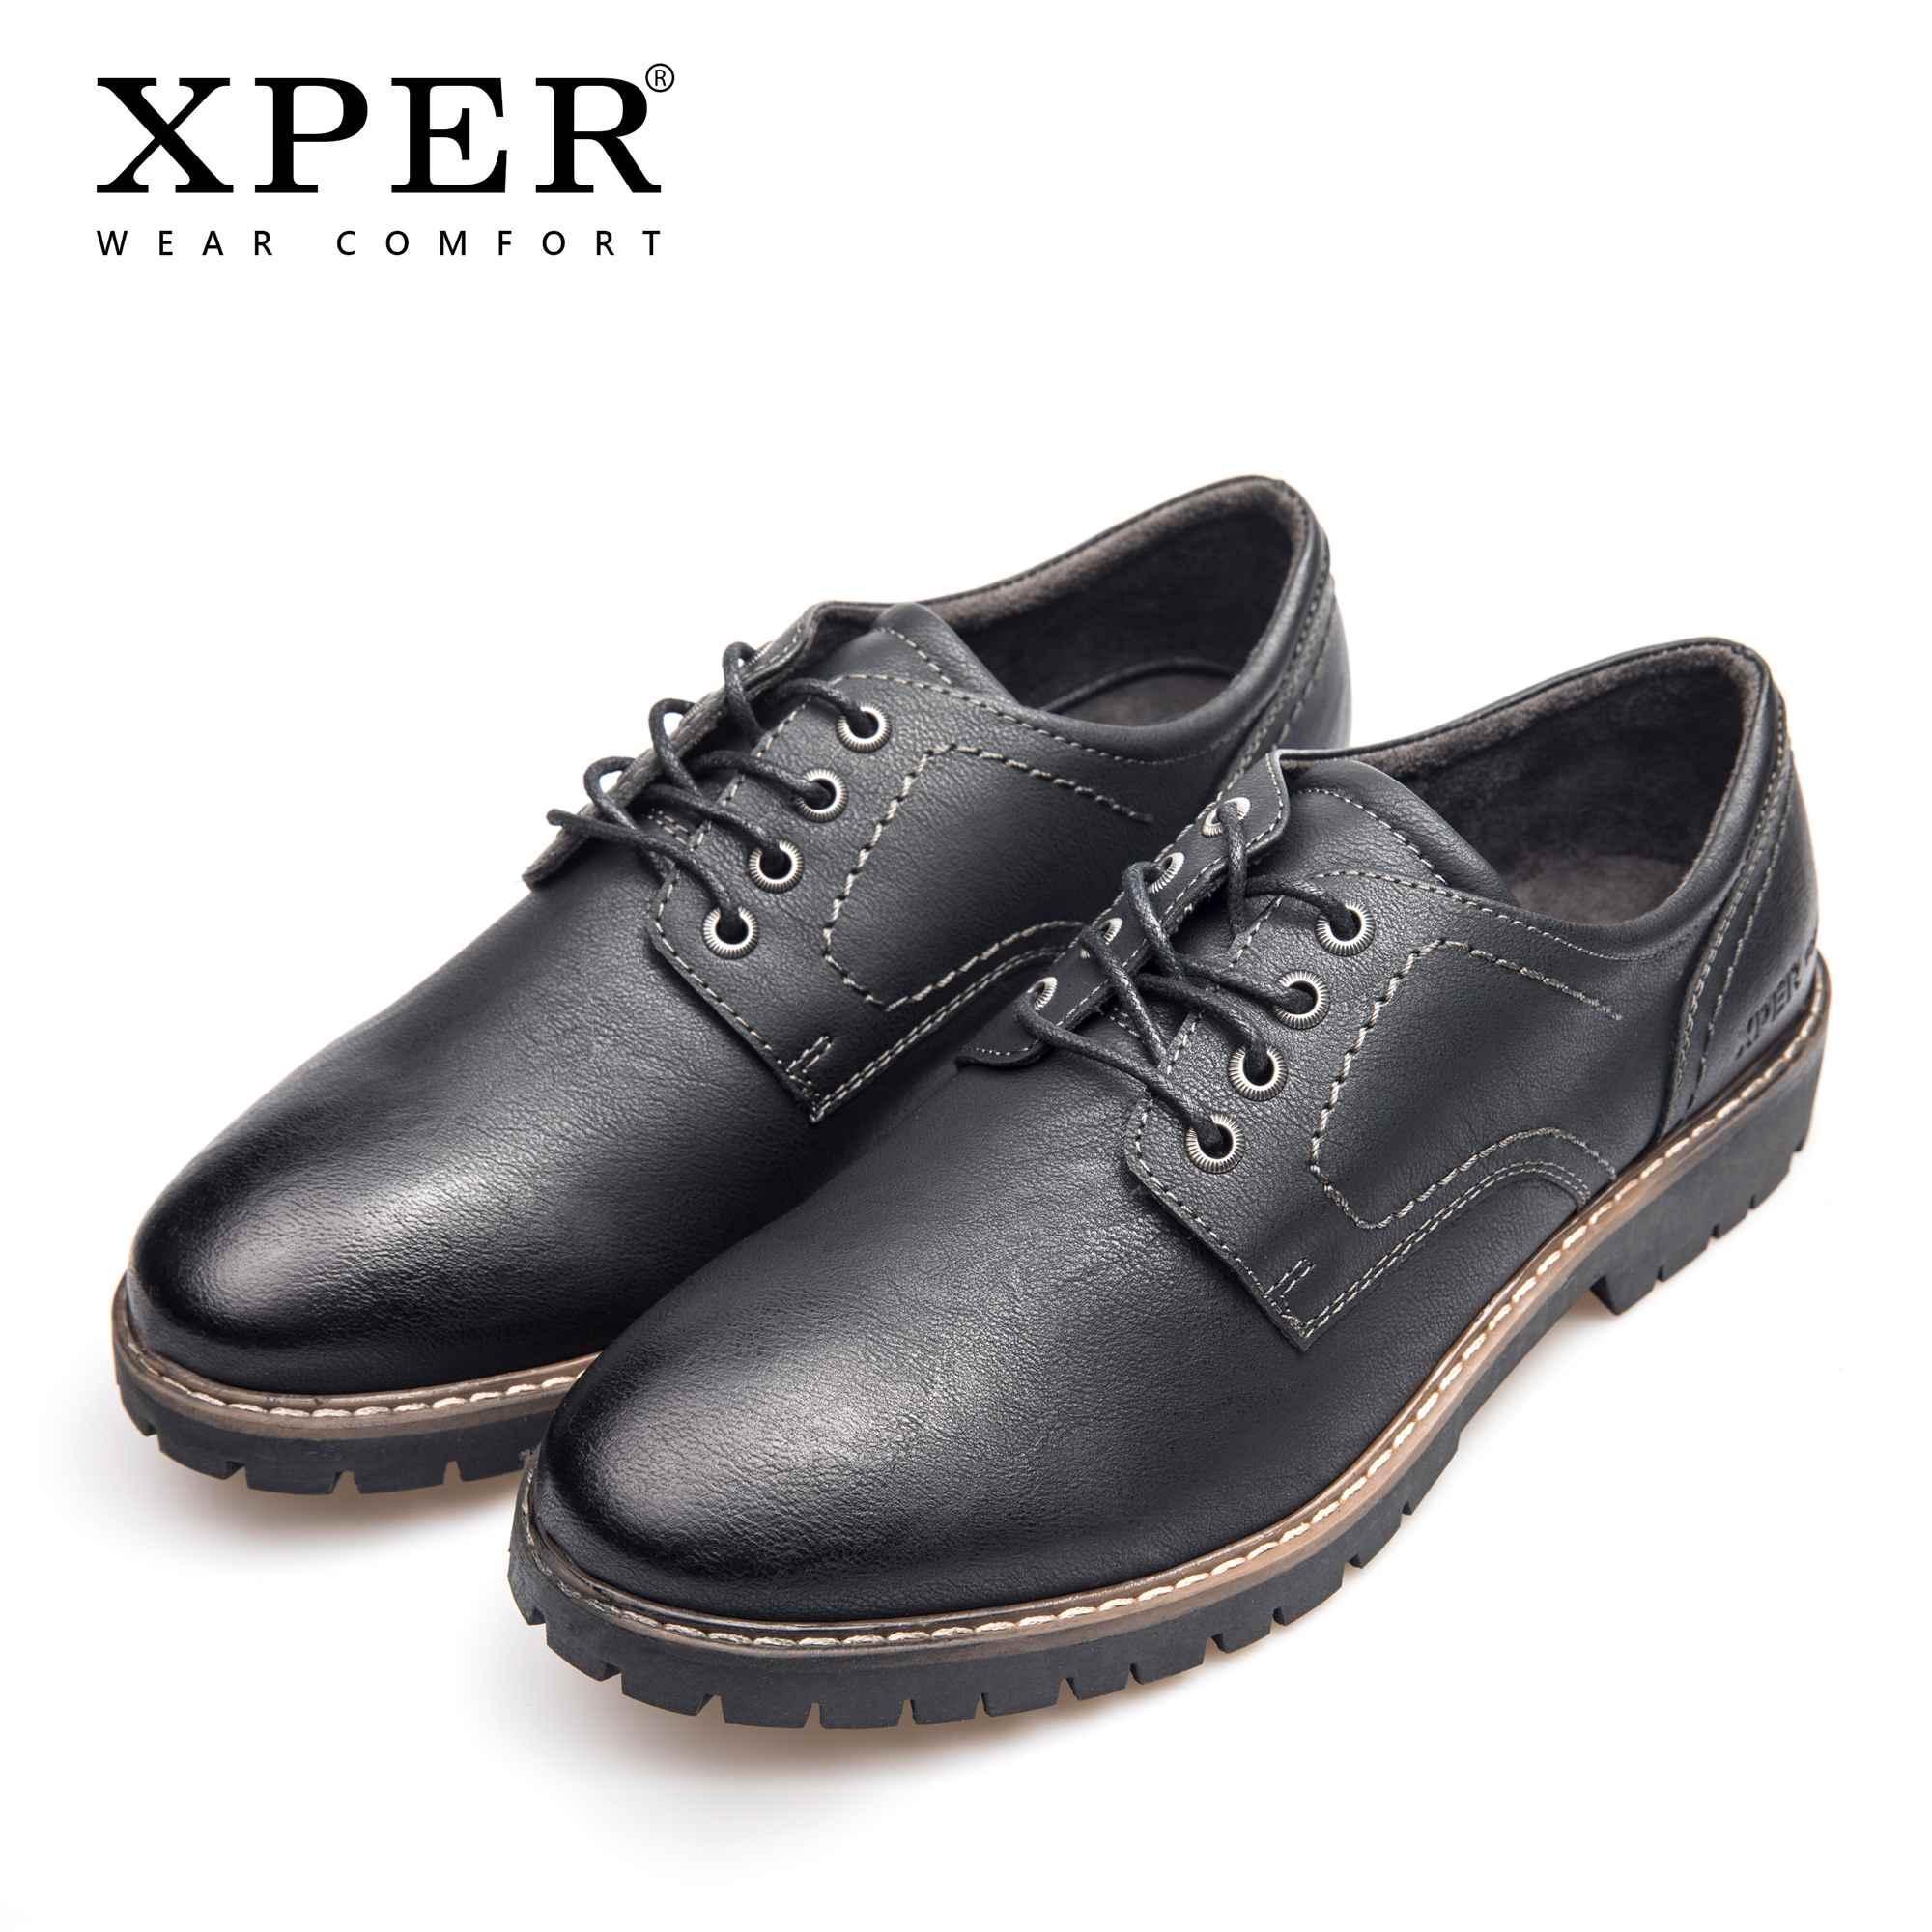 Herbst Lace FreizeitschuheXhy11201bl Oxfords Marke Formale Mode Up Schwarze Business Leder Xper Männer Kleid Schuhe Br QeWdCxBorE